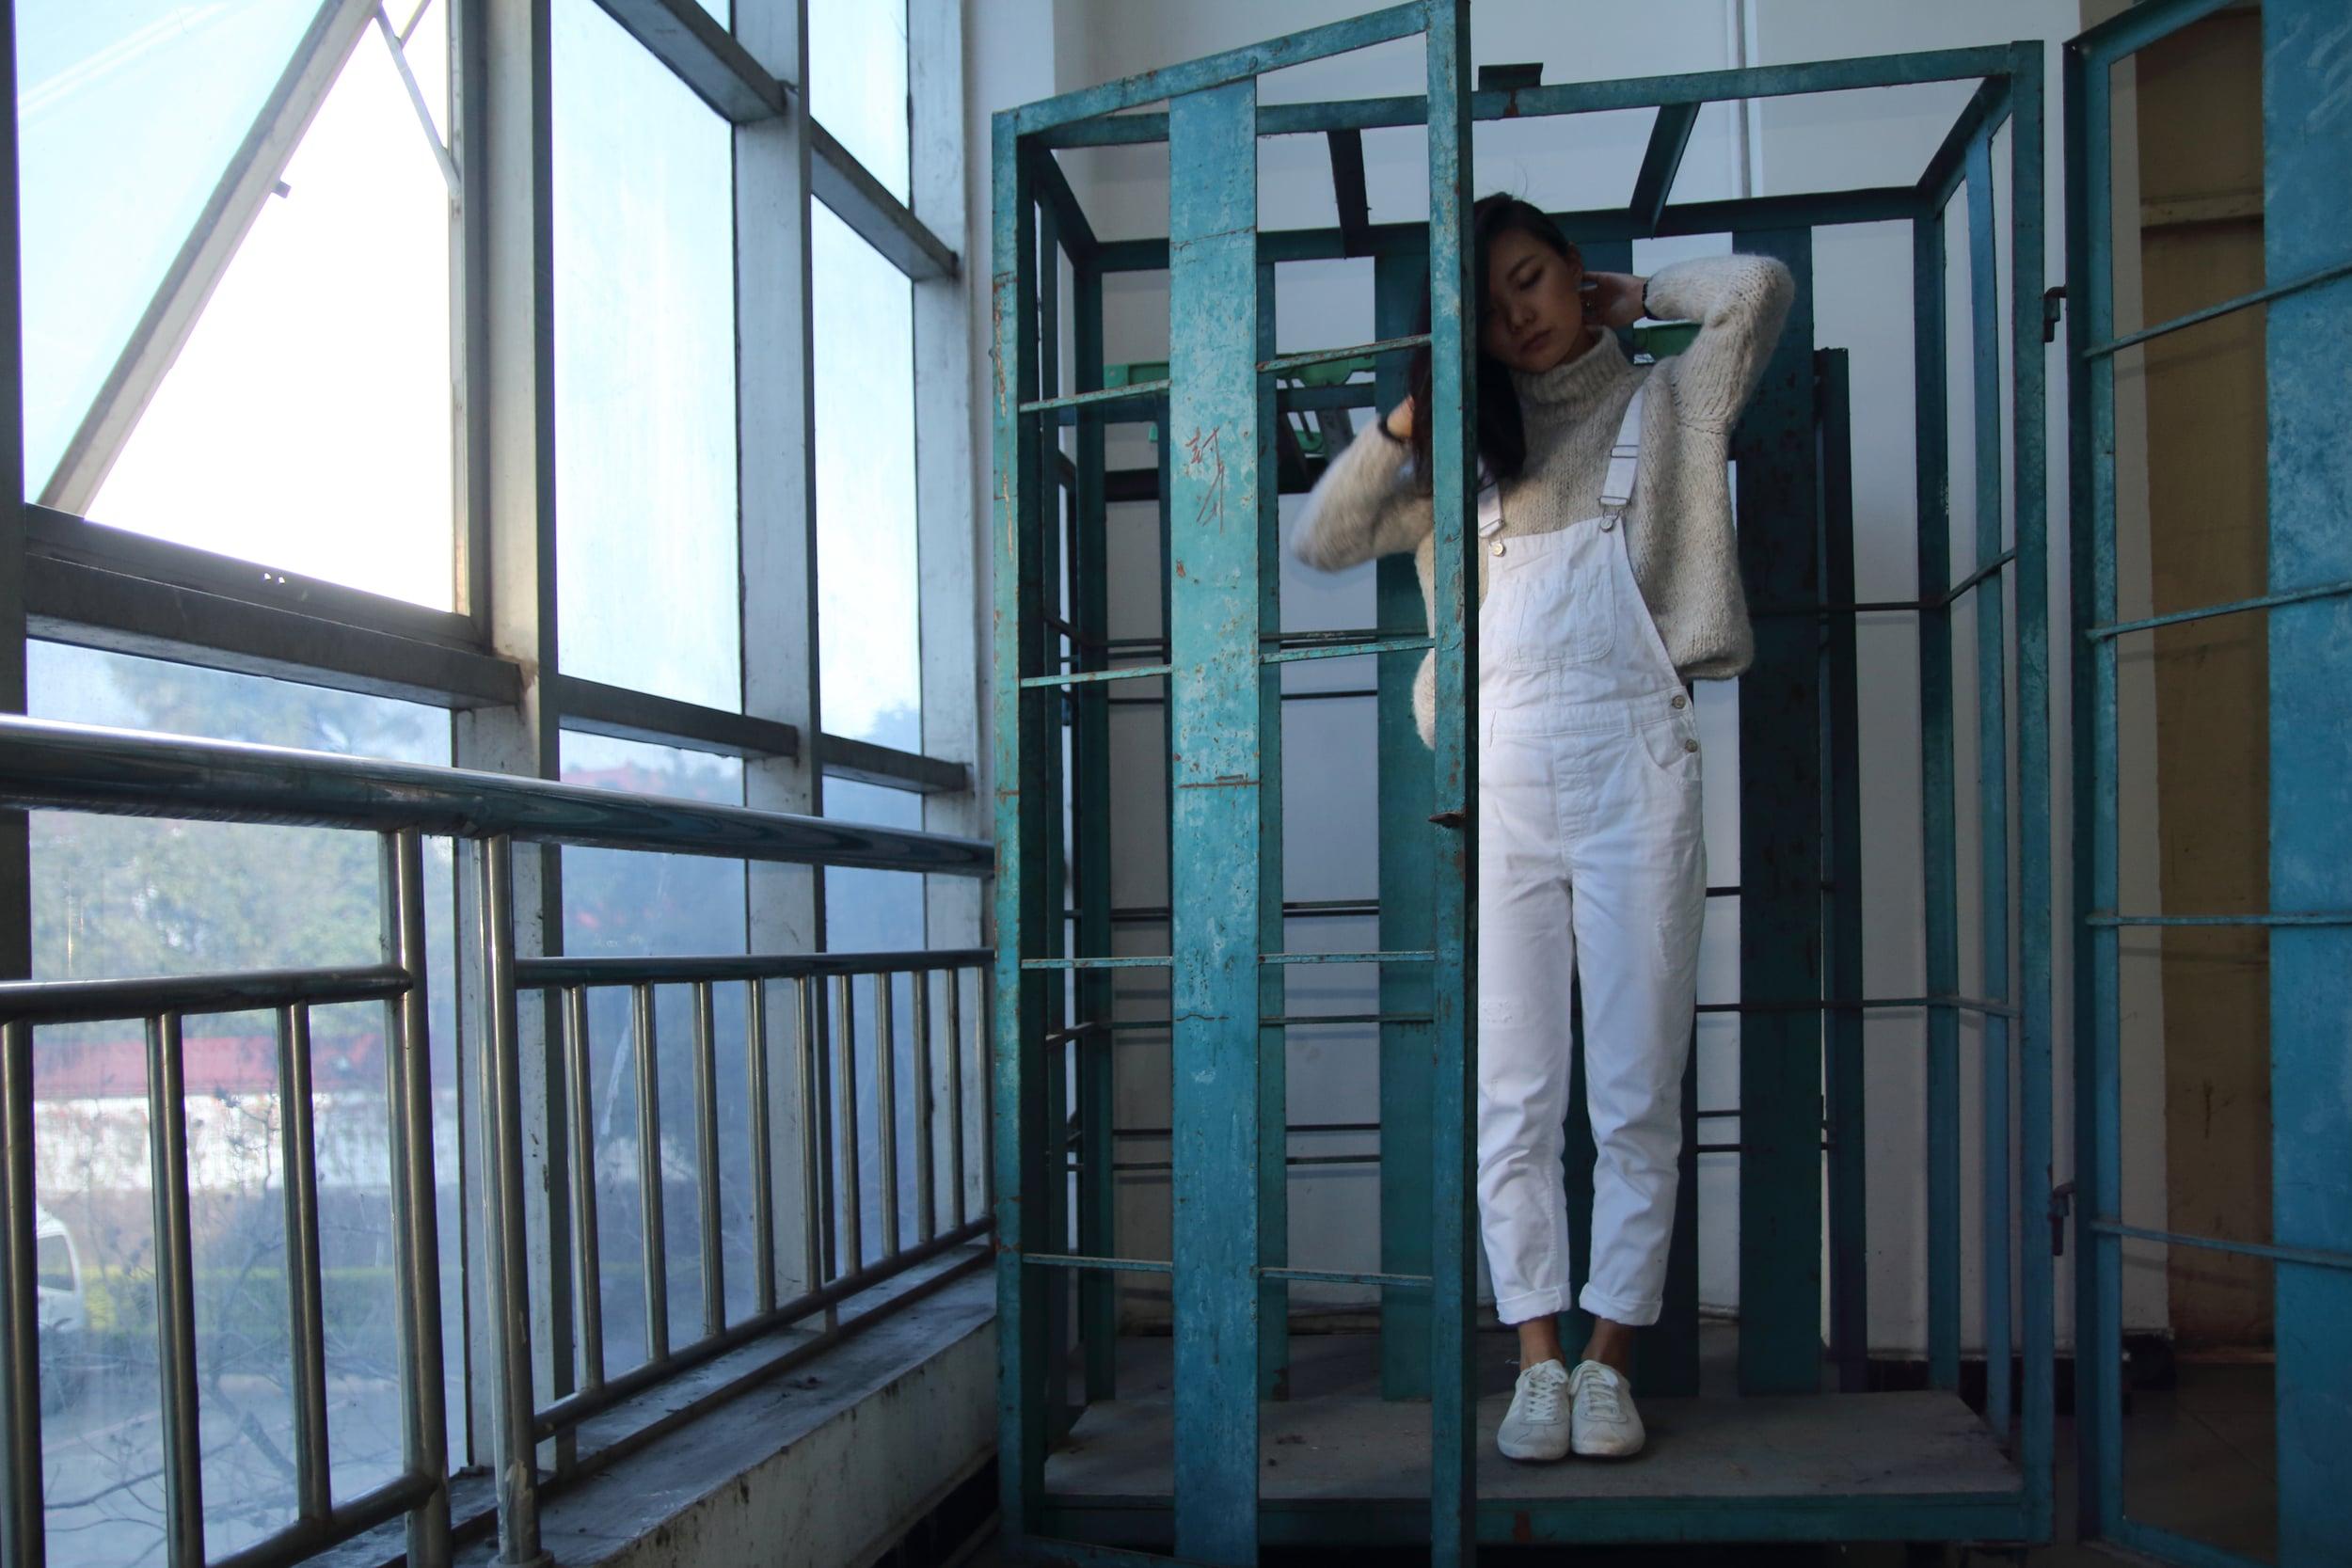 cage.jpg